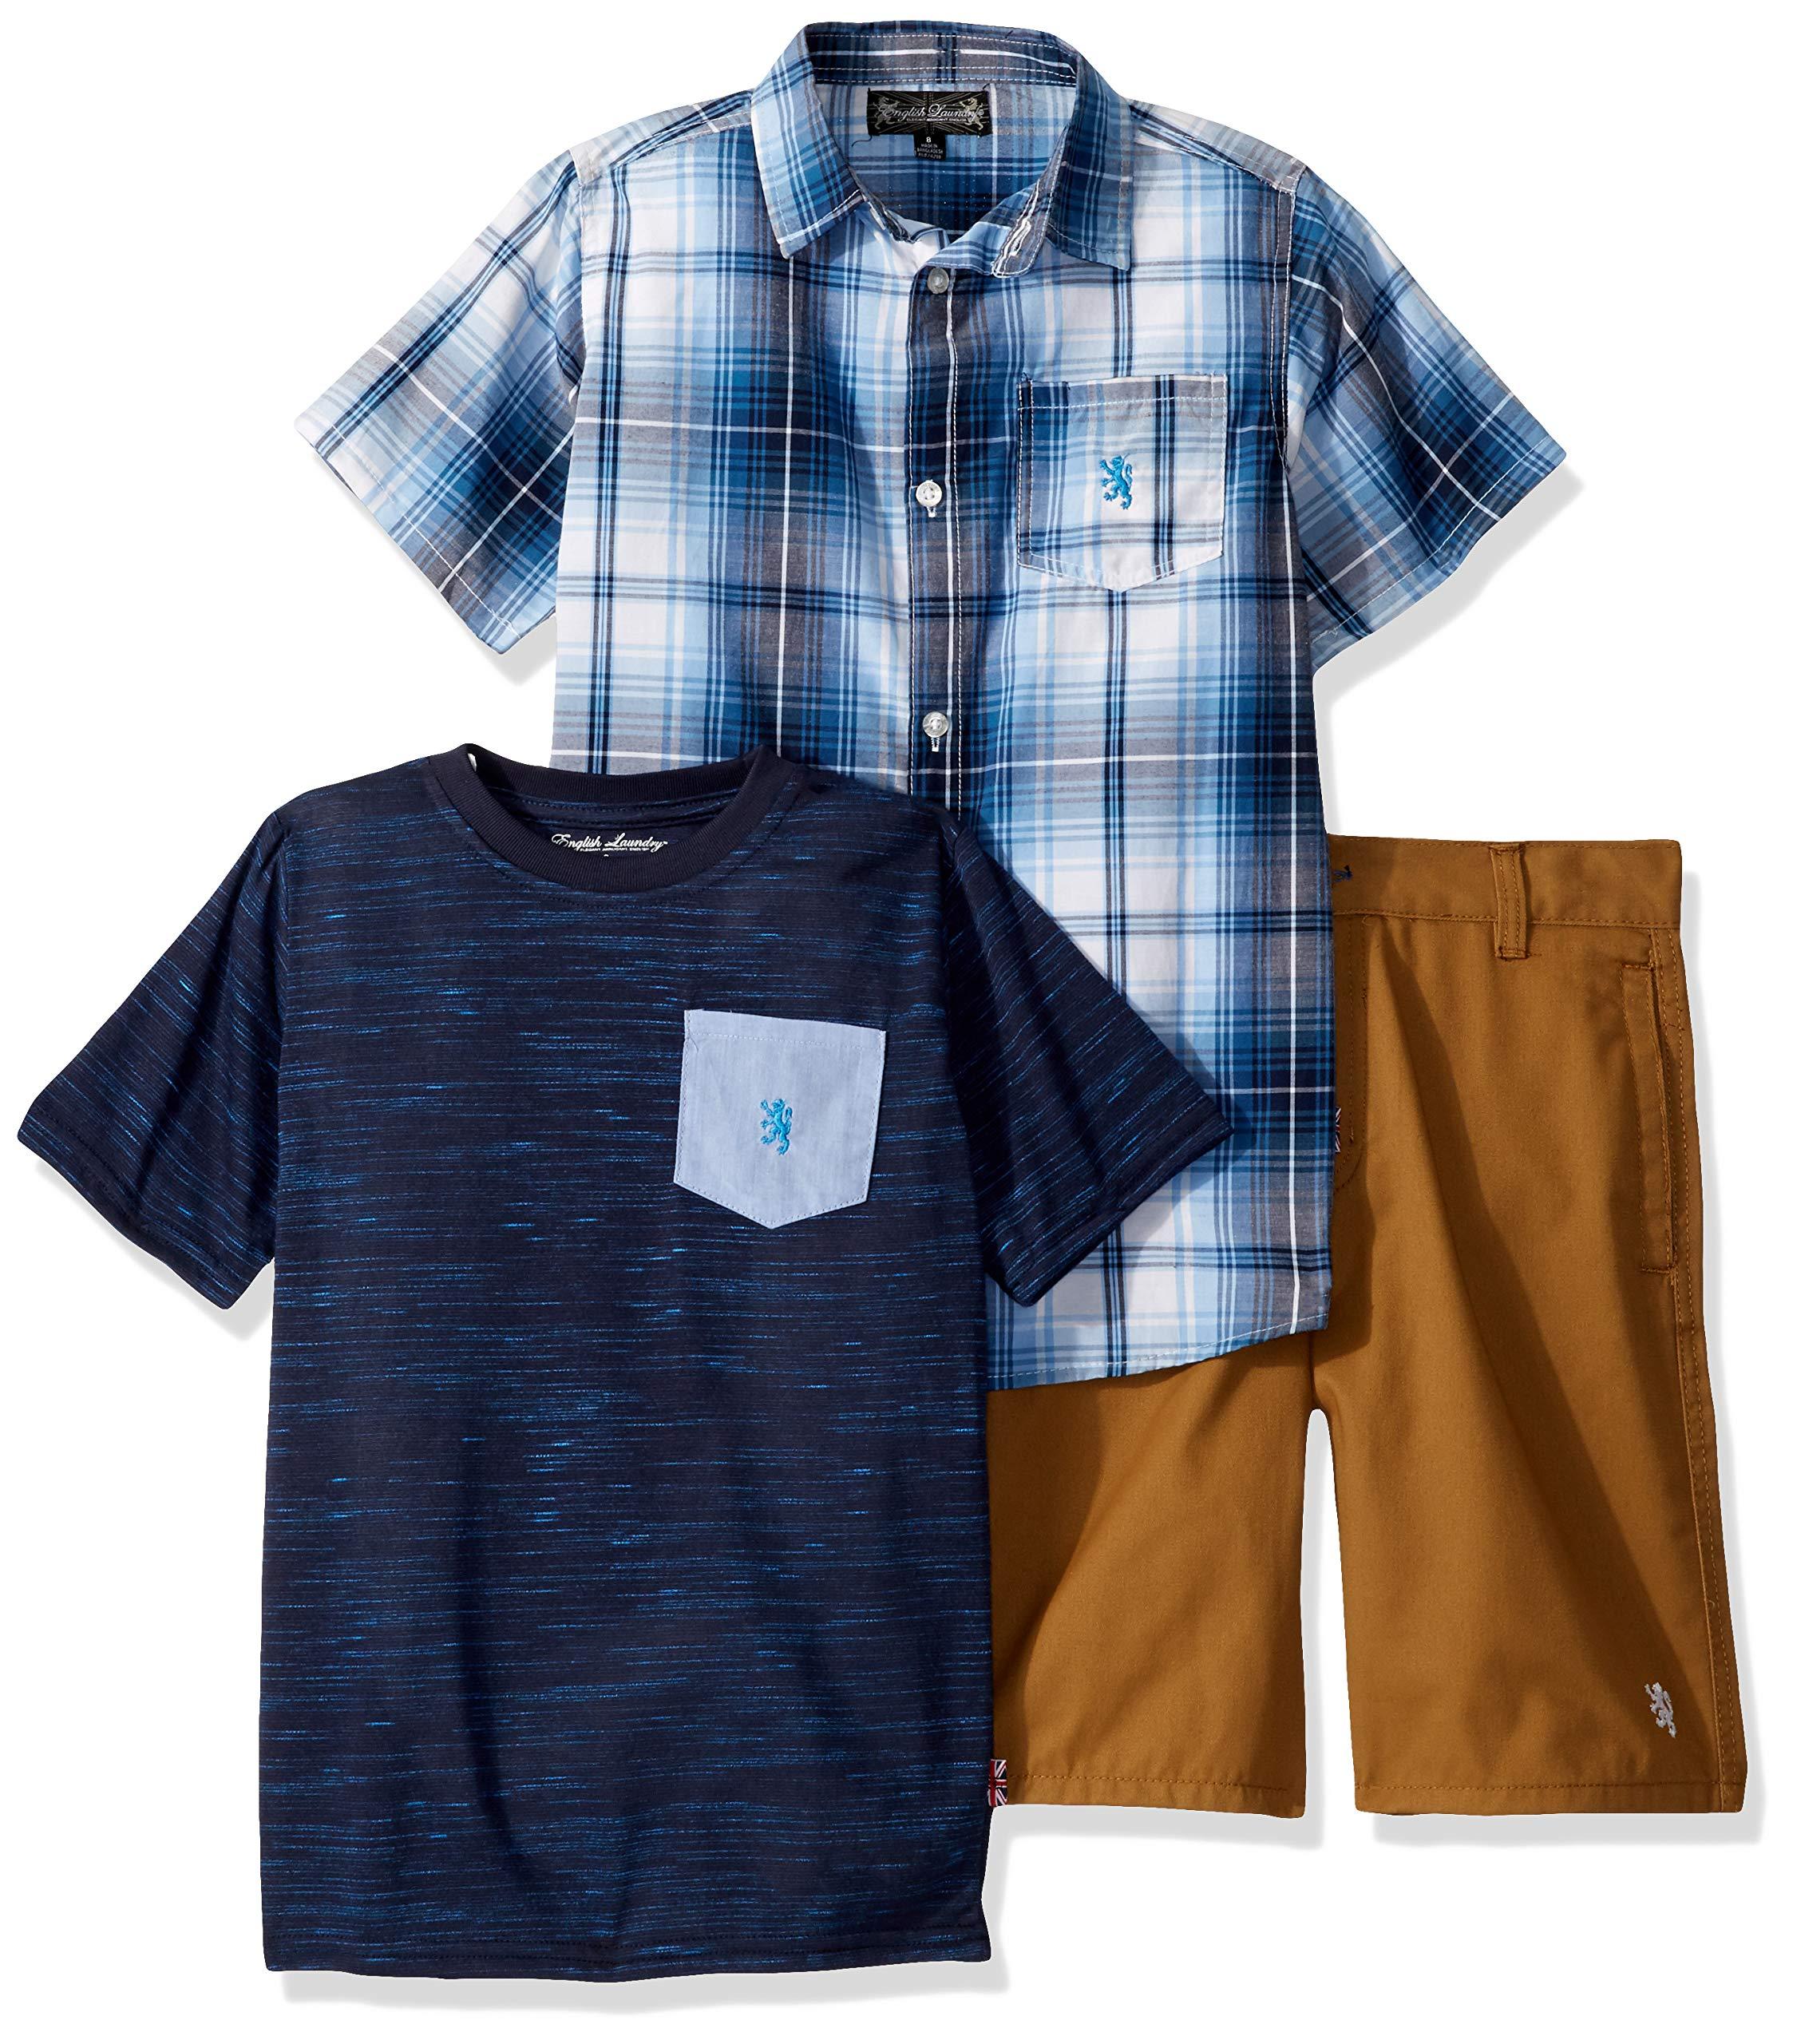 English Laundry Boys' Big Sleeve Plaid Woven, T-Shirt, and Short Set, Multi, 10